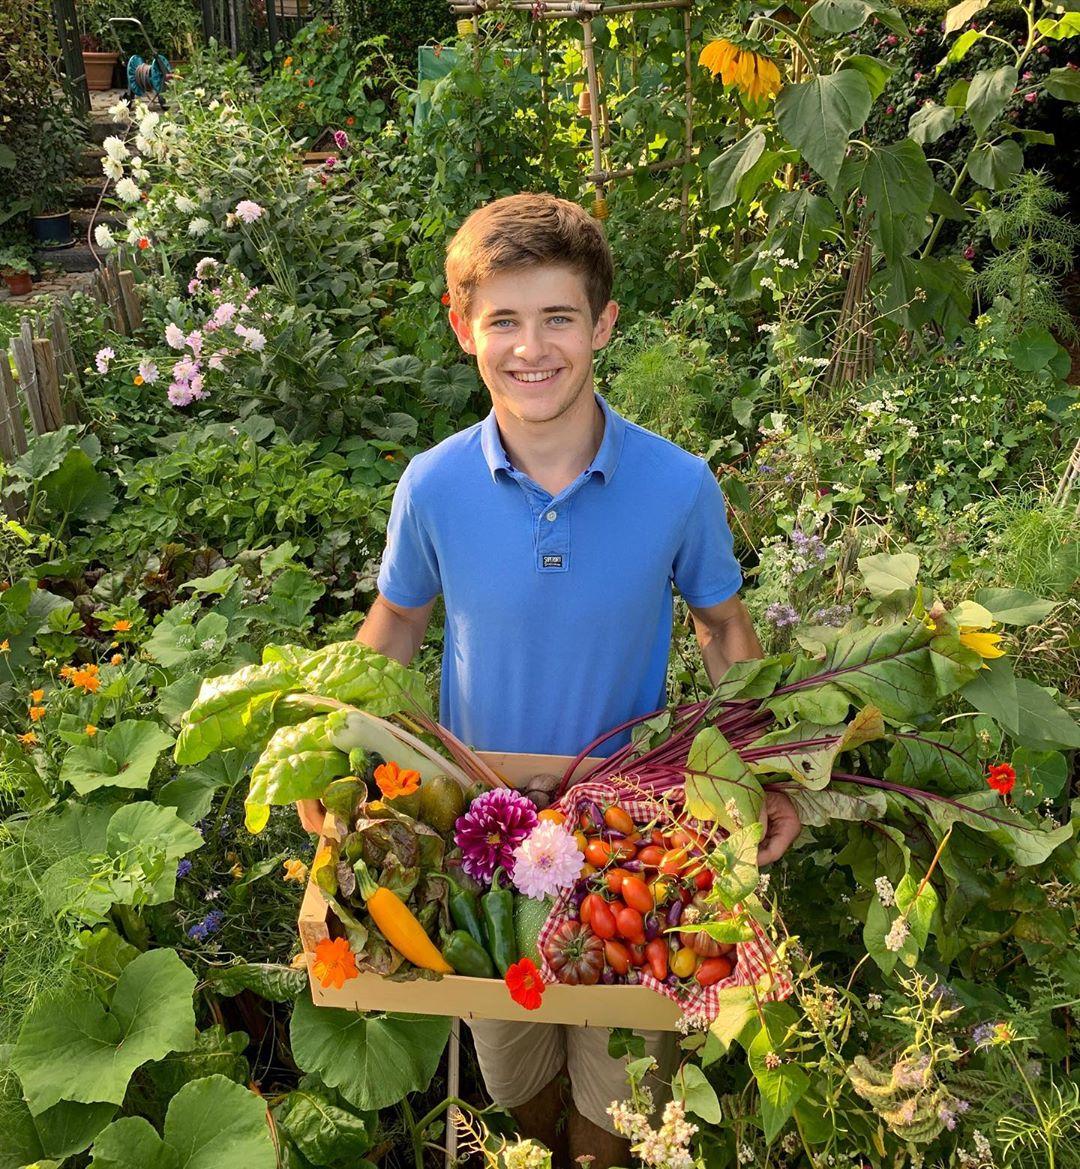 10.000 Followers On Instagram... Wow! I Kitchengarden - Gardening